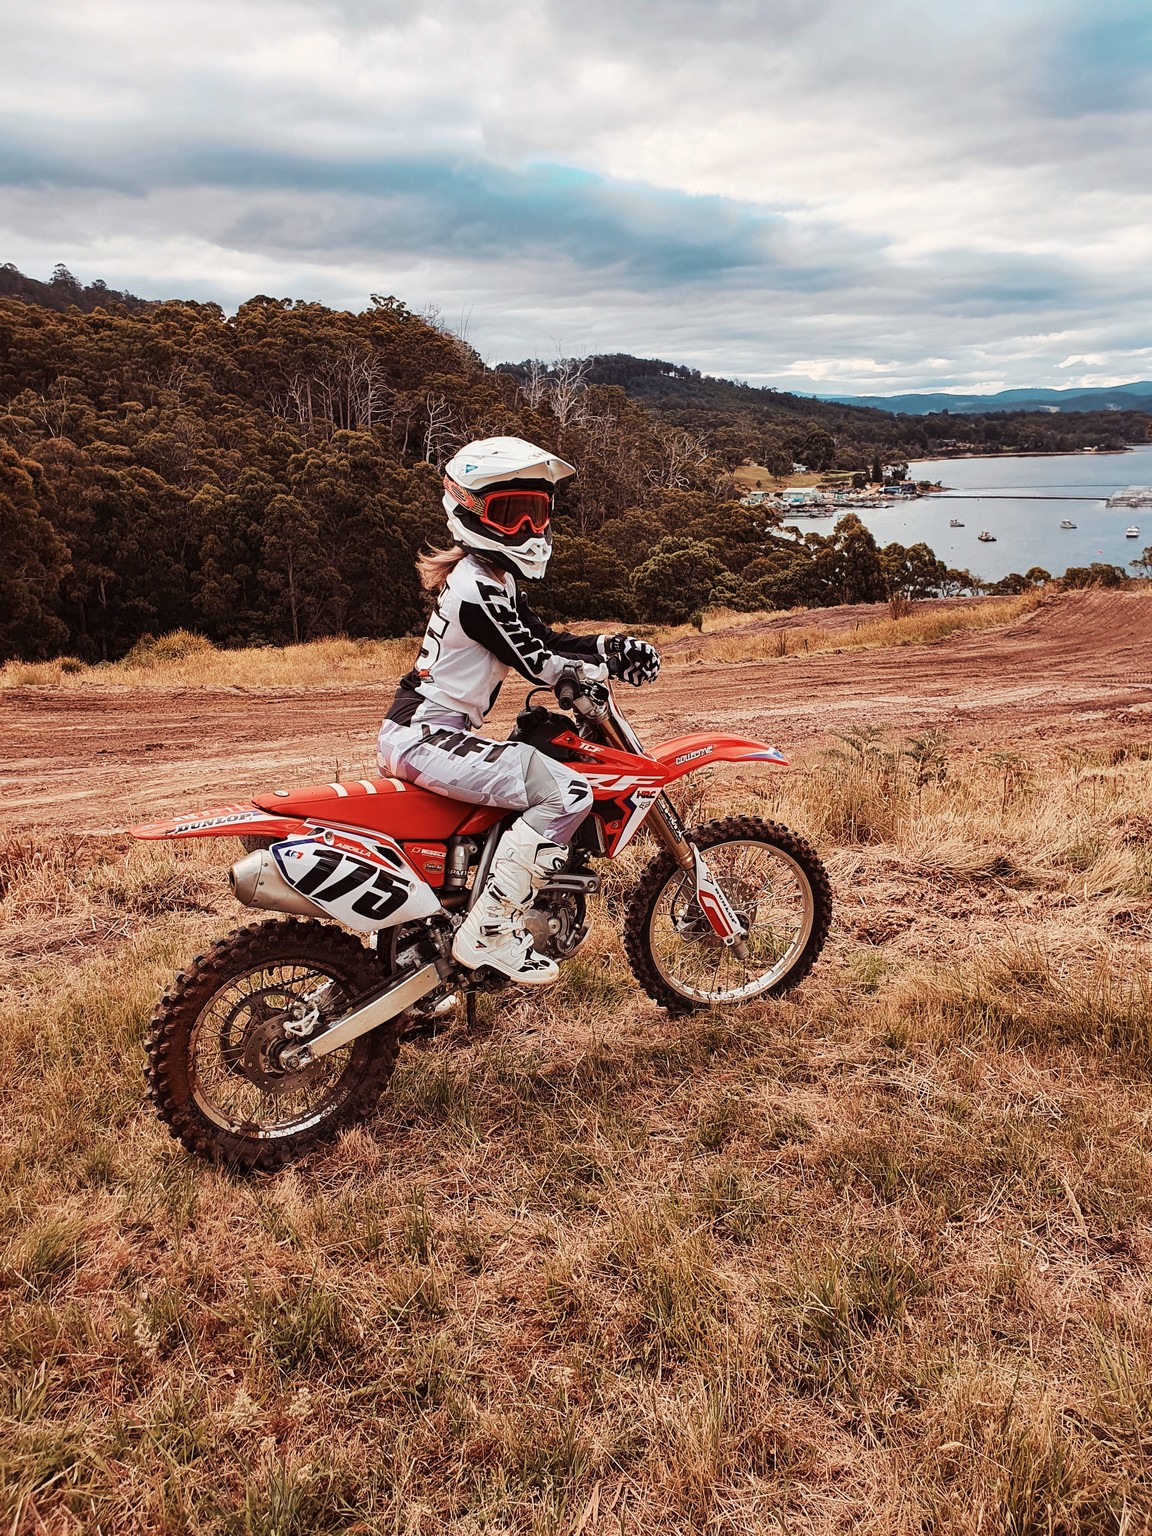 Woman on a motocross motorcycle at dusk in a Tasmanian field